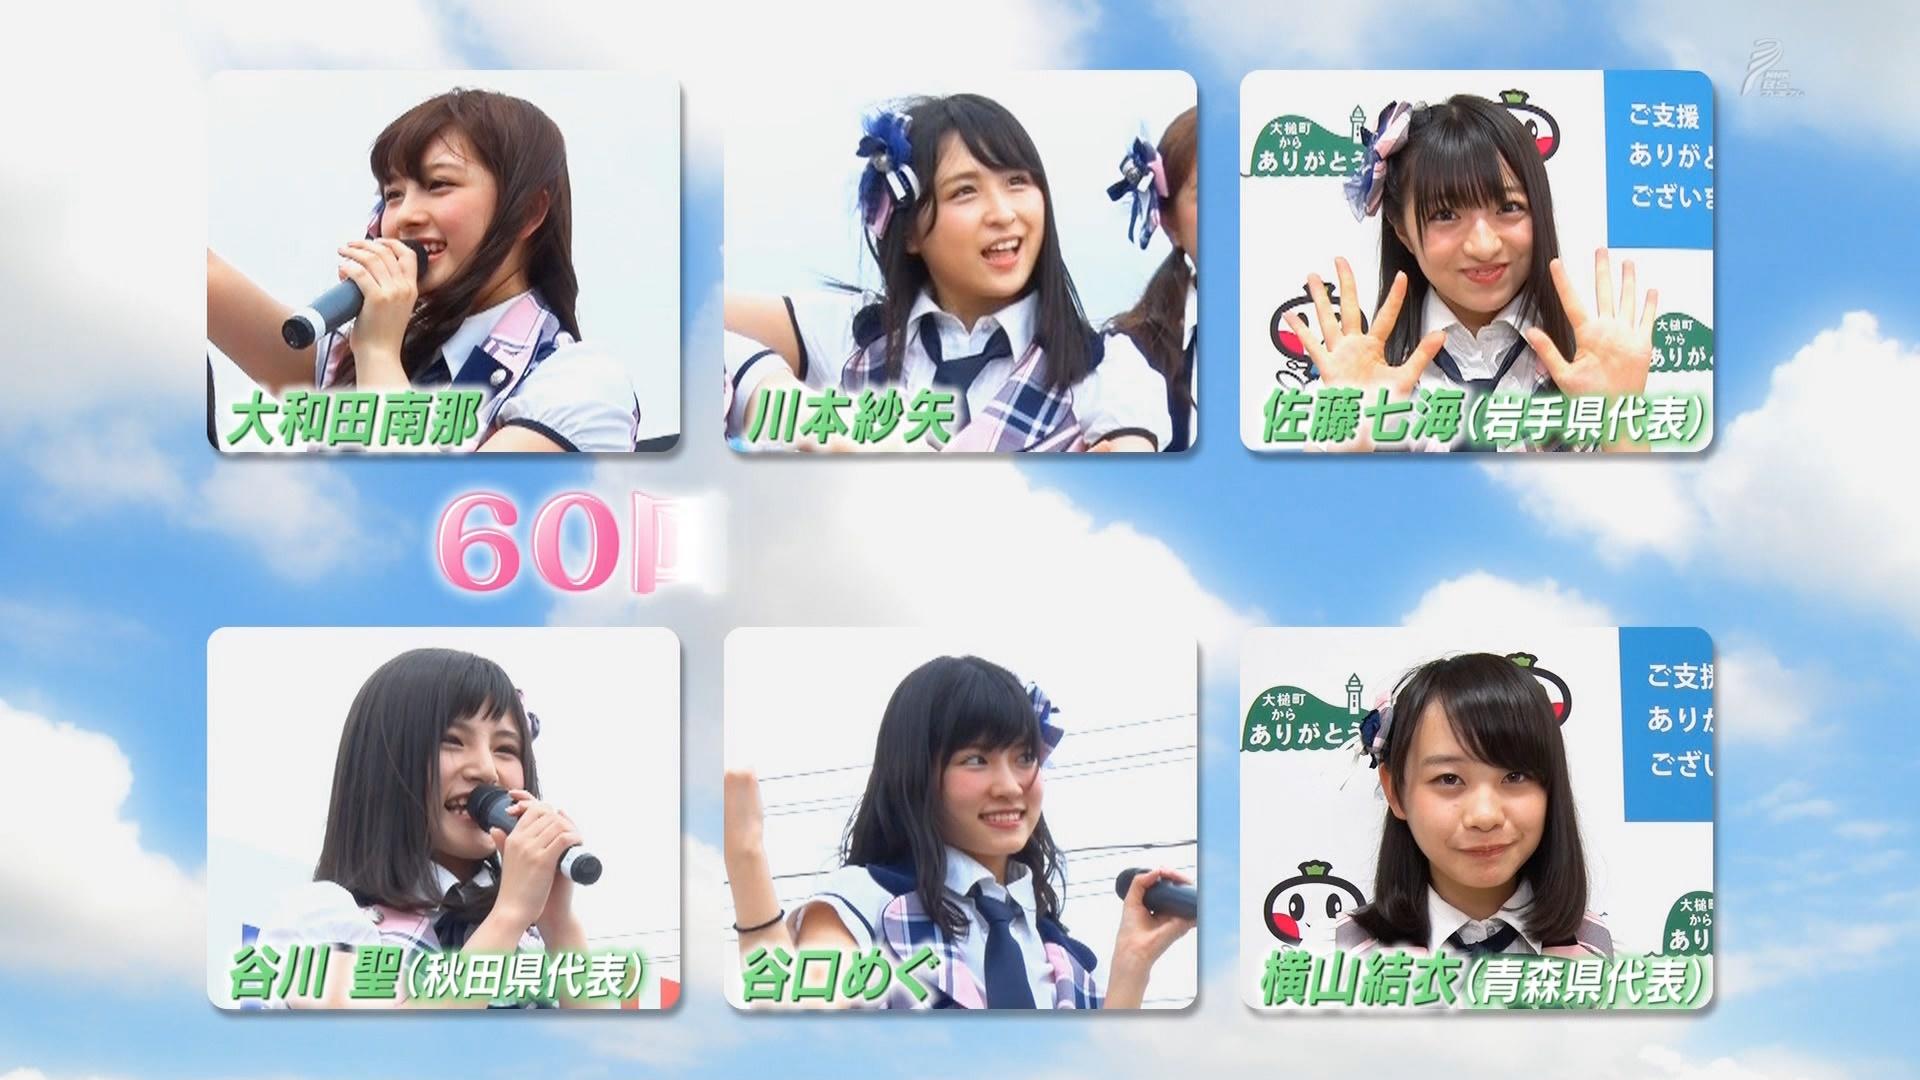 【AKB48】川本紗矢応援スレ★45【さやや】YouTube動画>51本 ->画像>575枚